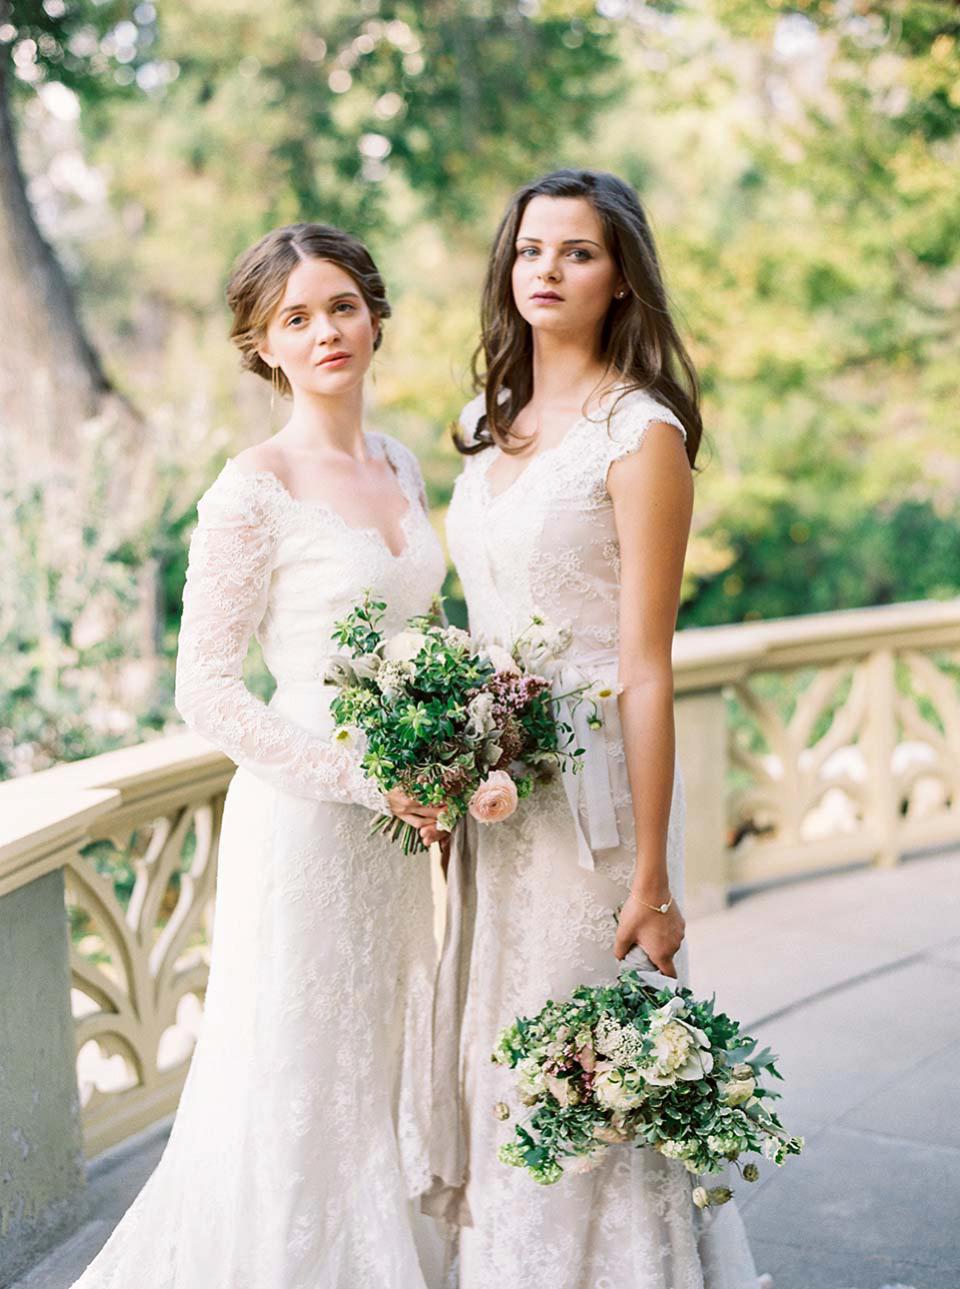 Karen Willis Holmes – The Marriage Of Timeless Bridal Fashion Design & On-Trend Style